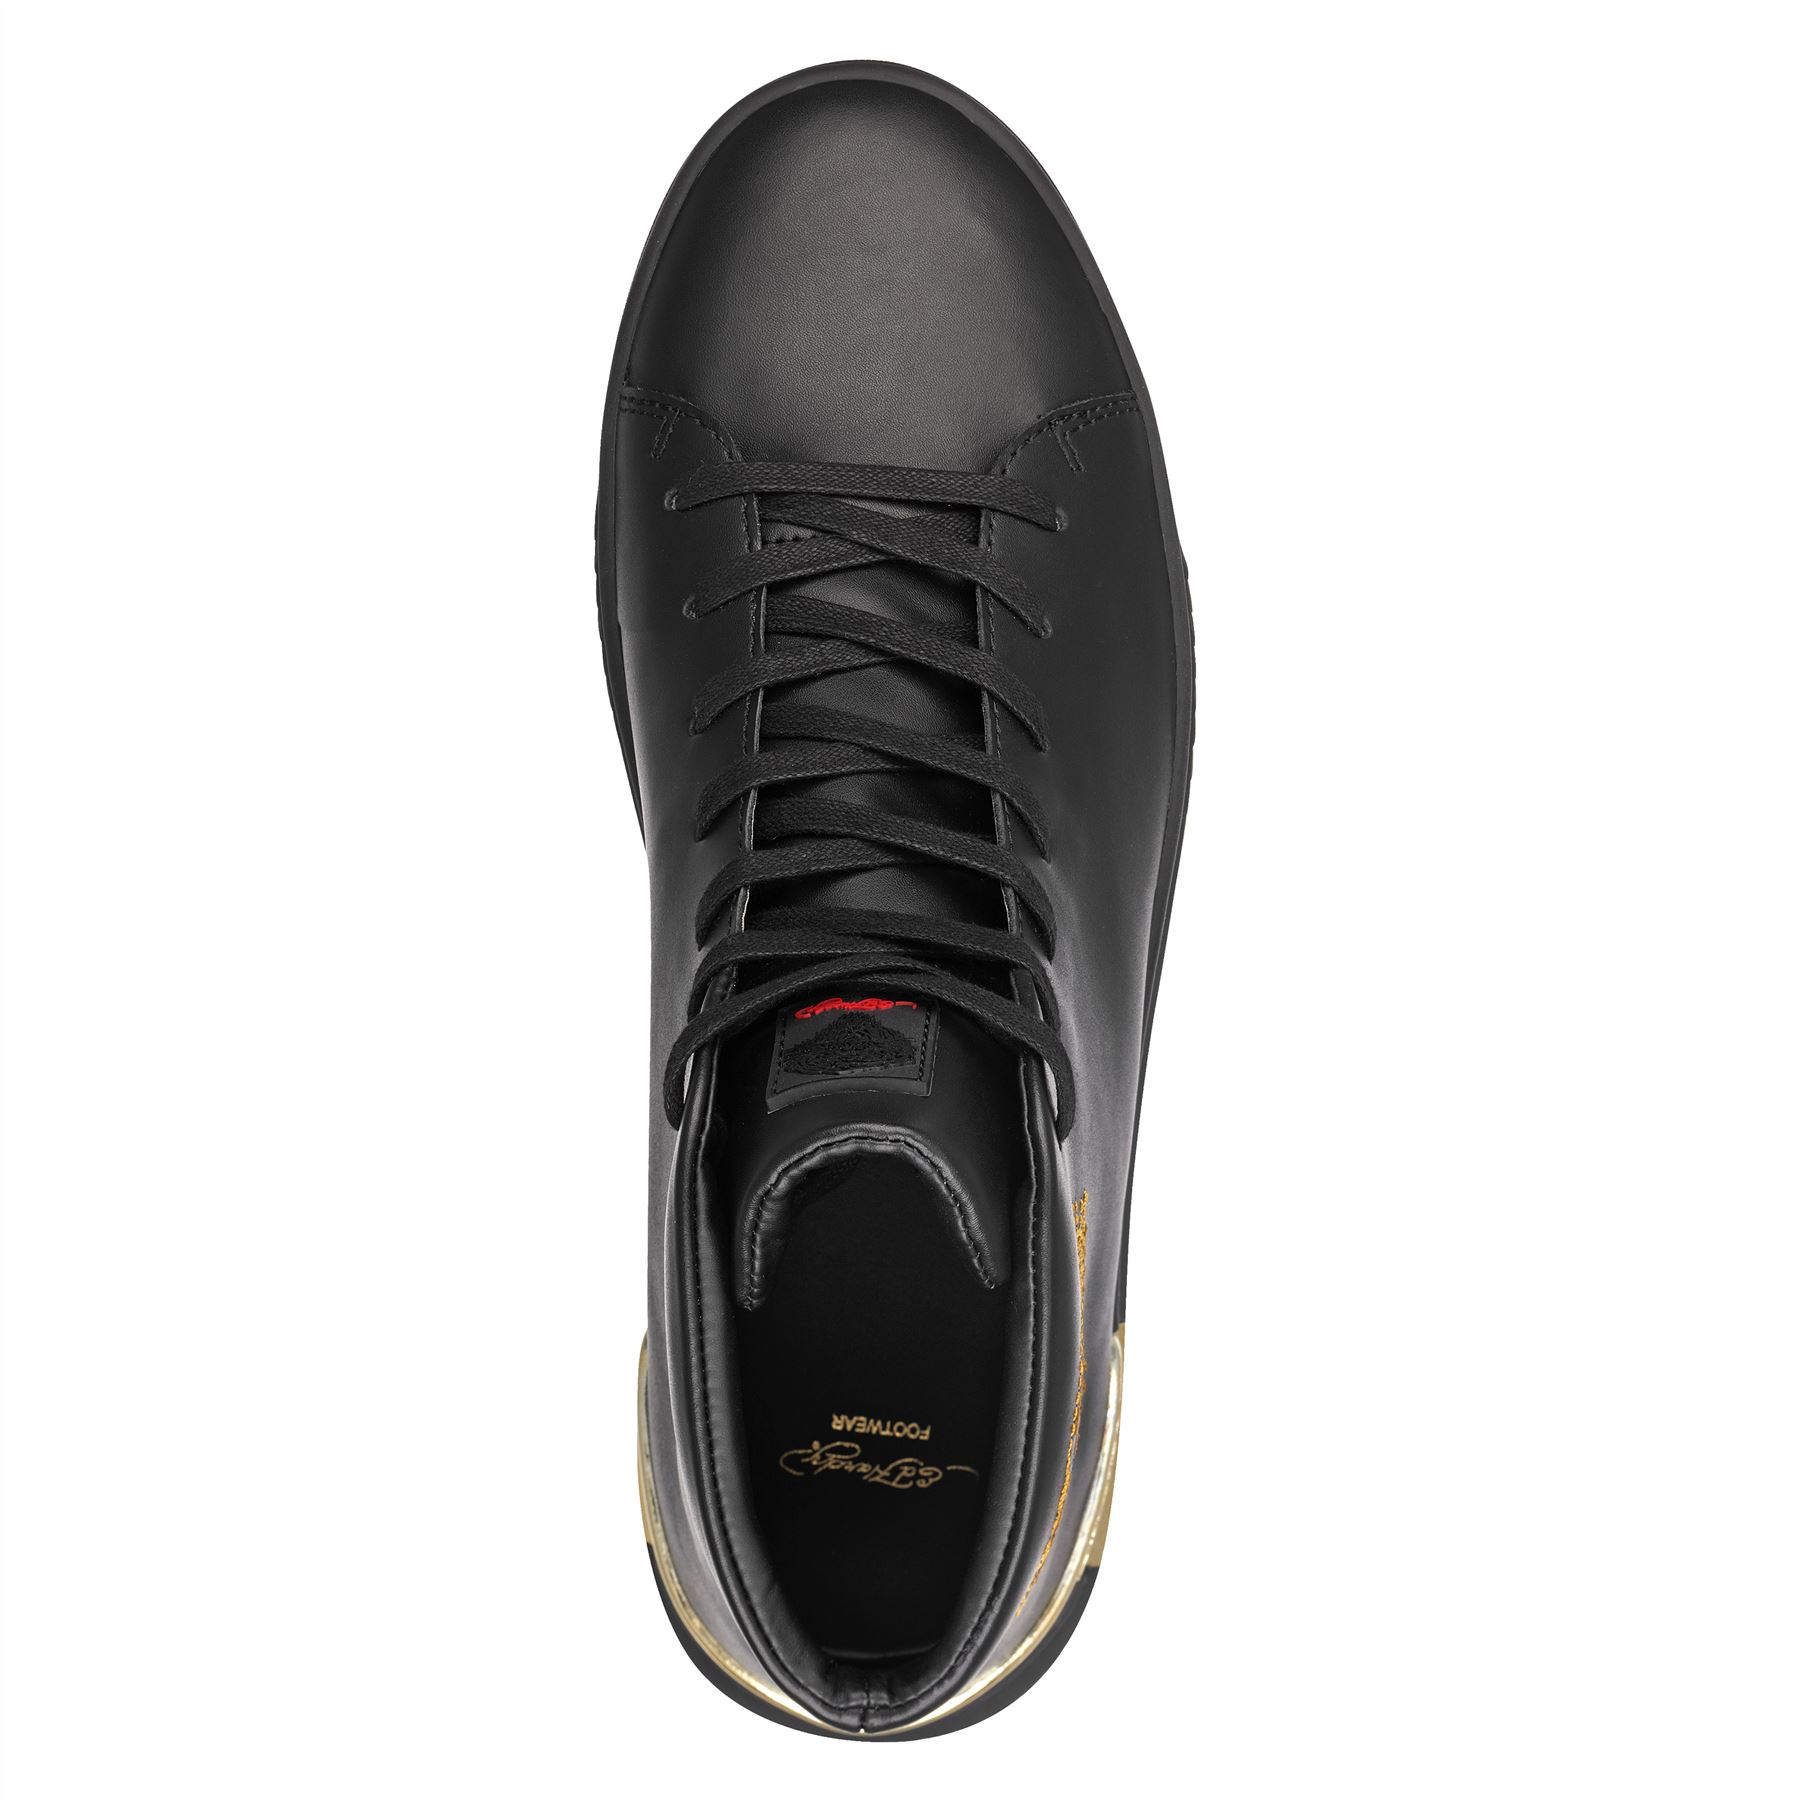 Ed Hardy Hardy Hardy Homme Bête Montant Broderie Imprimé Tigre Baskets Noires Chaussures e636ea